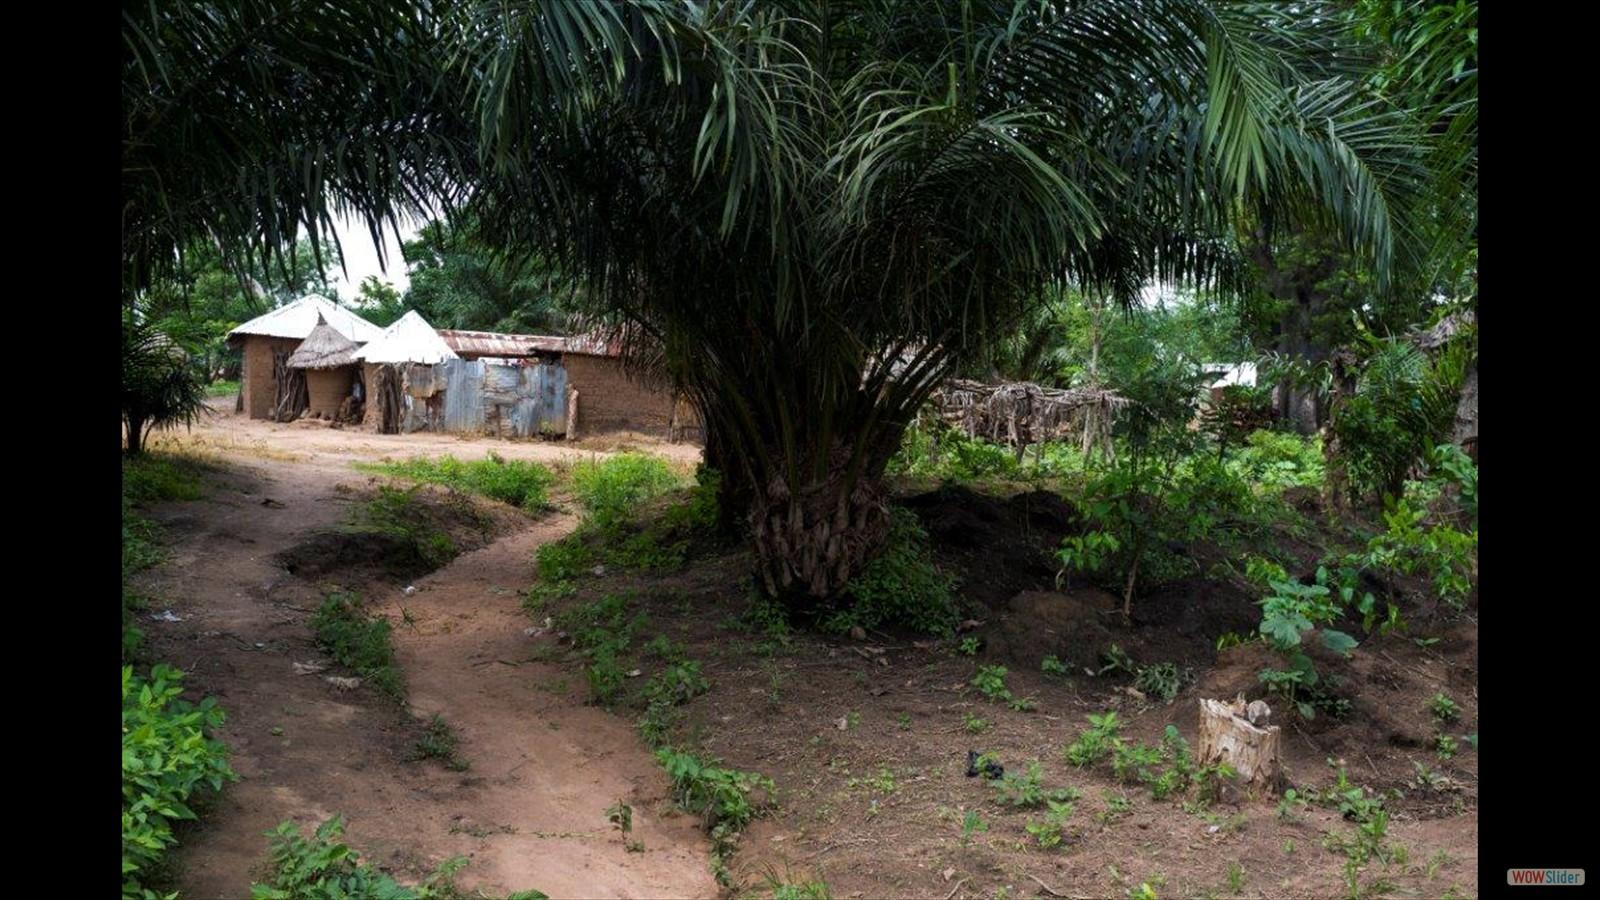 Houses of poor people in the neighborhood of the farm